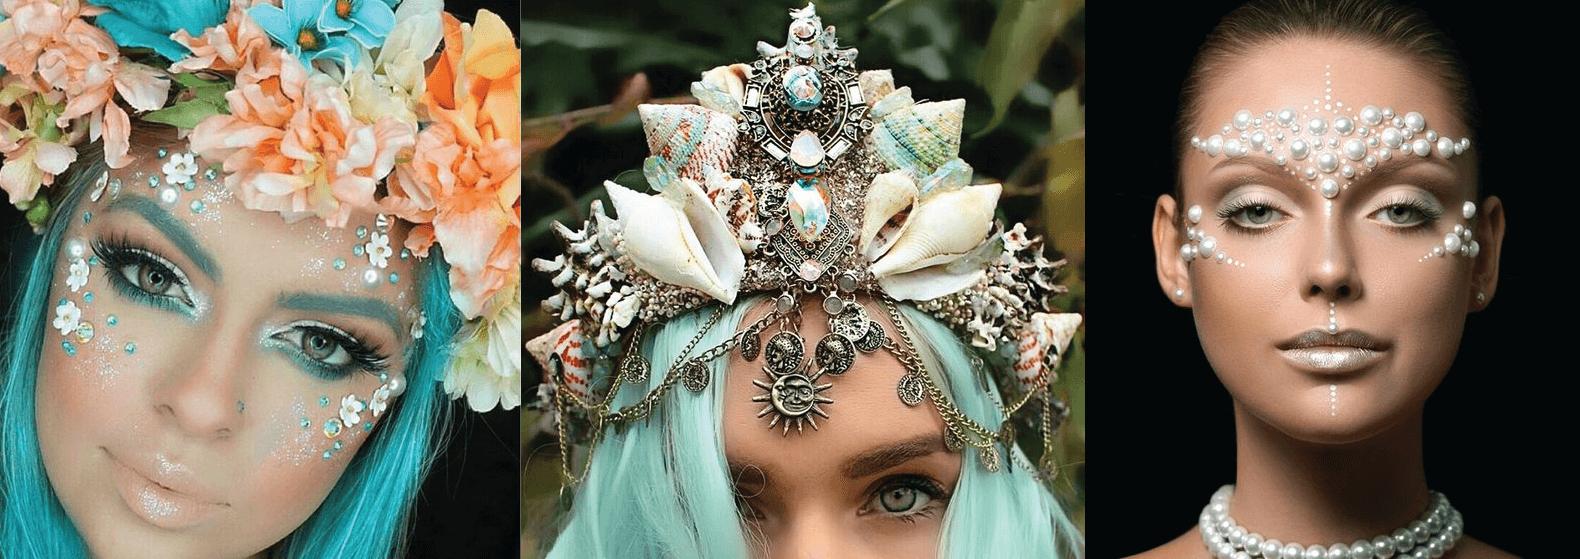 Kapuluan's favorite mermaid halloween looks